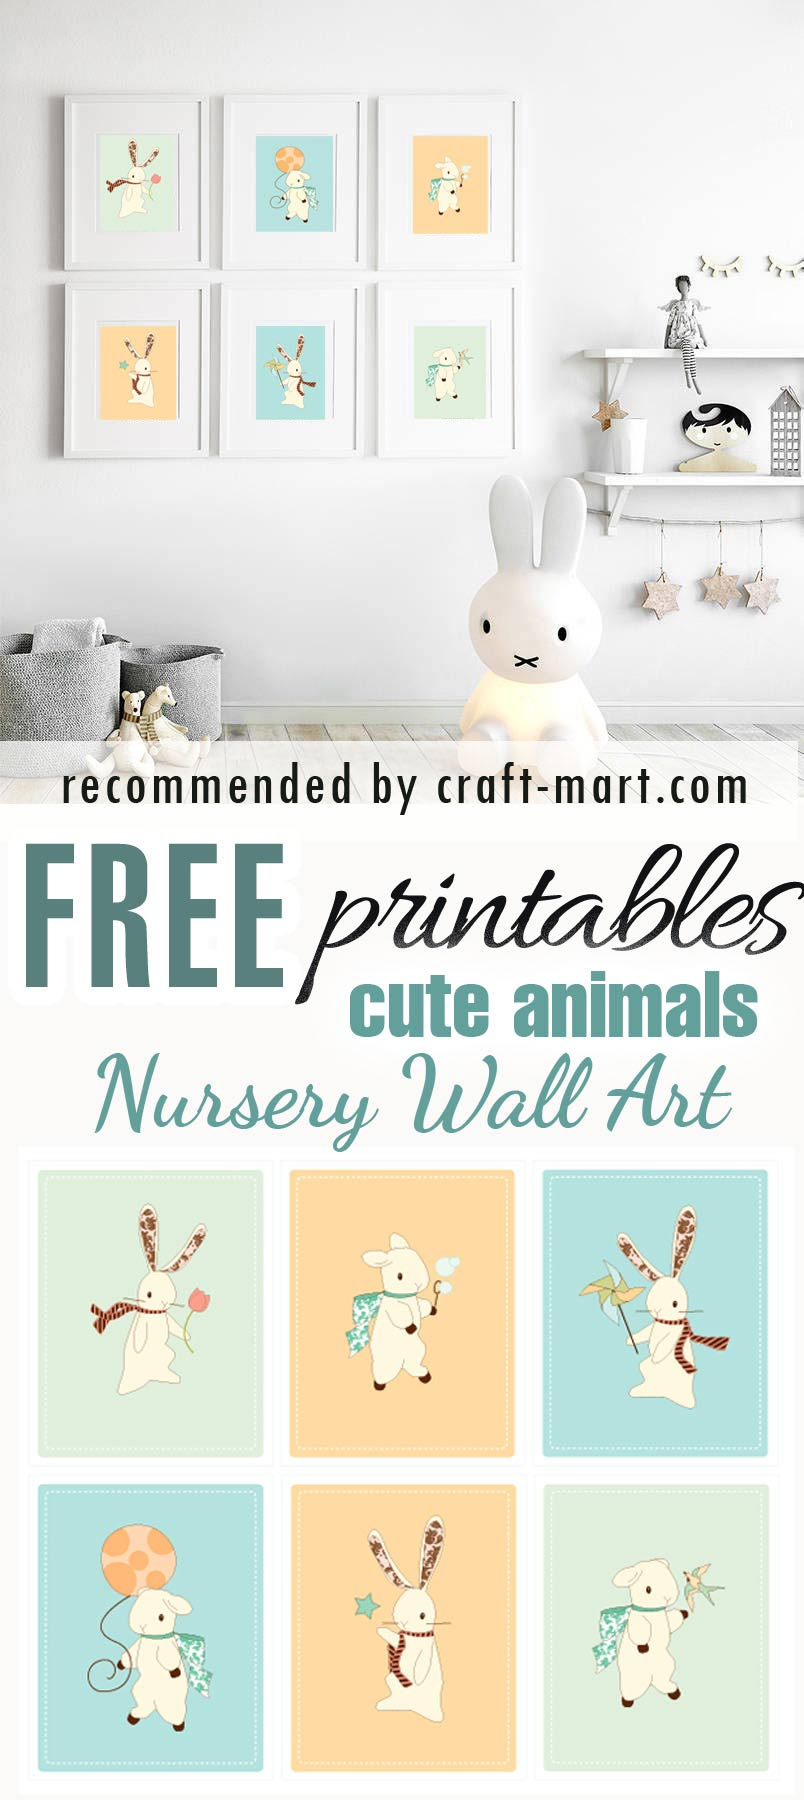 Cute Fairy Tale Animals Free Nursery Printables #freeprintables #freenurseryprints #freenurserywallart #cutenurseryprints #cuteanimalsfreeprintables #animalsfreenurseryprintables